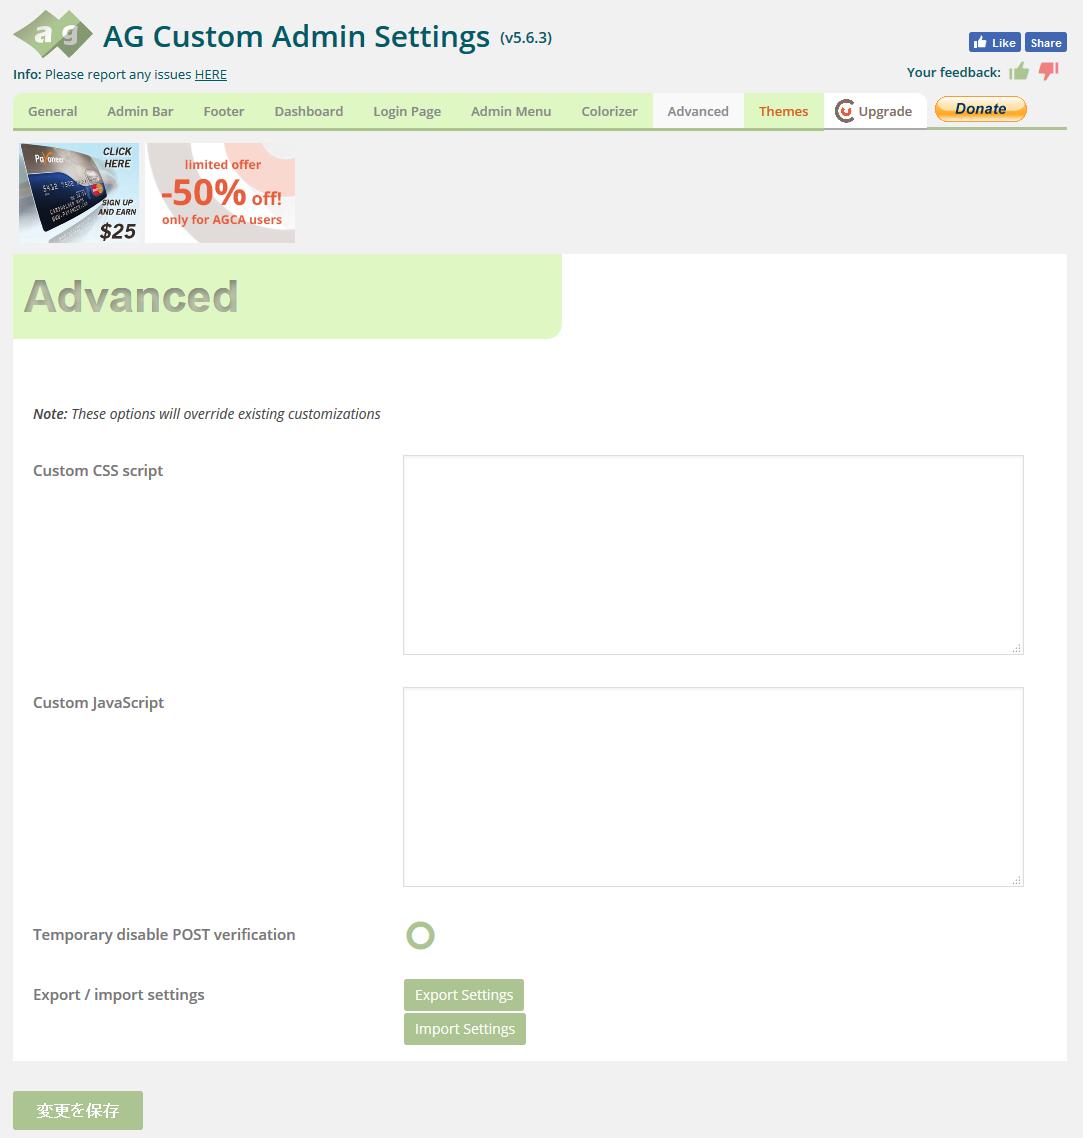 Wp Login: 【WP】管理画面をカスタマイズできるプラグイン「AG Custom Admin」